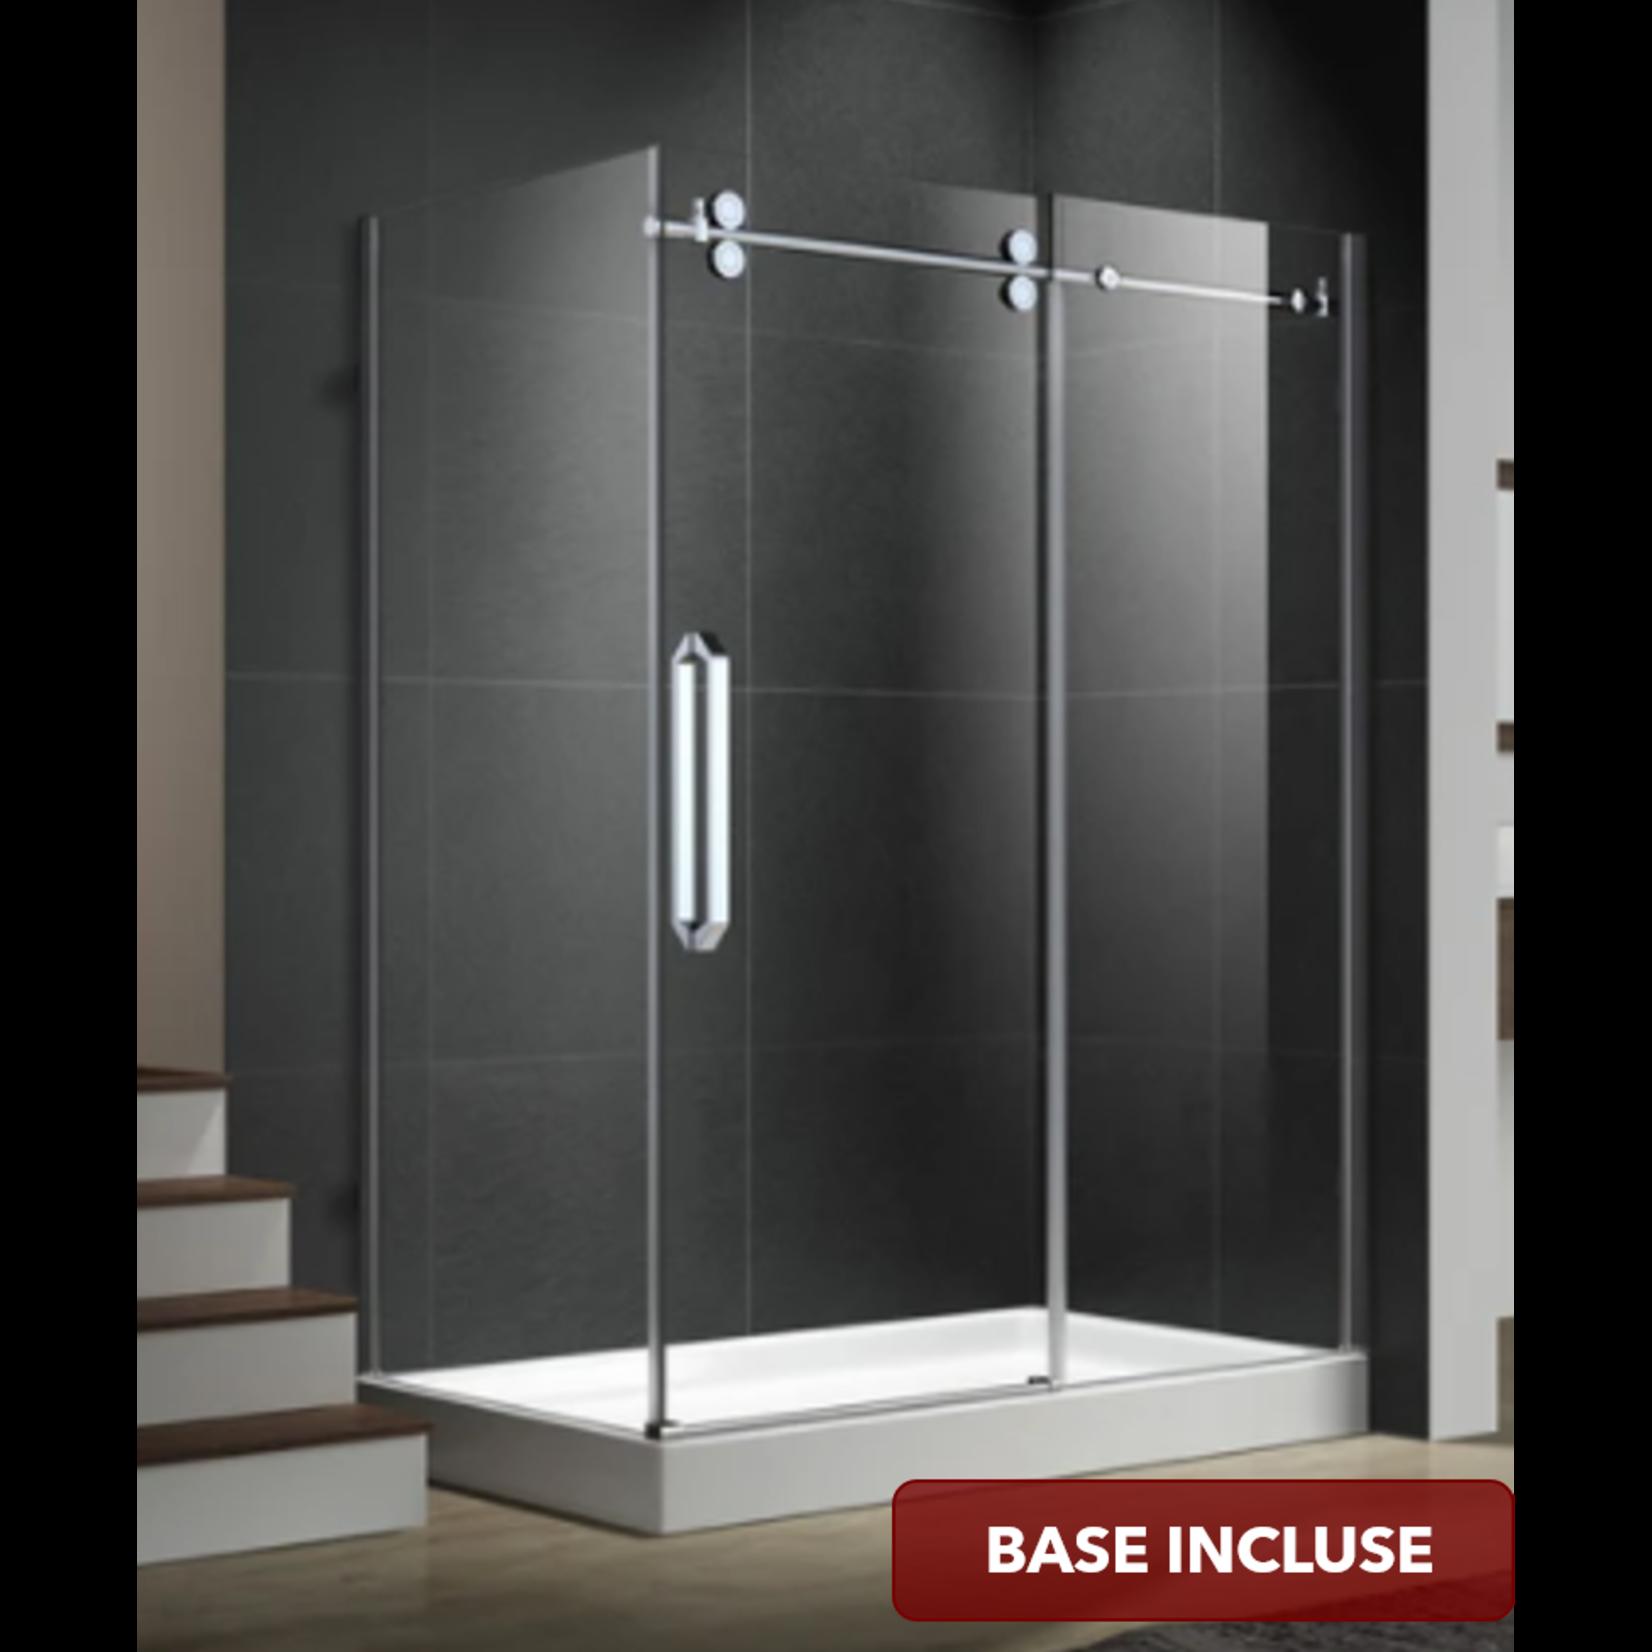 Reversible shower set 36x48 chrome Zirkon Apo series